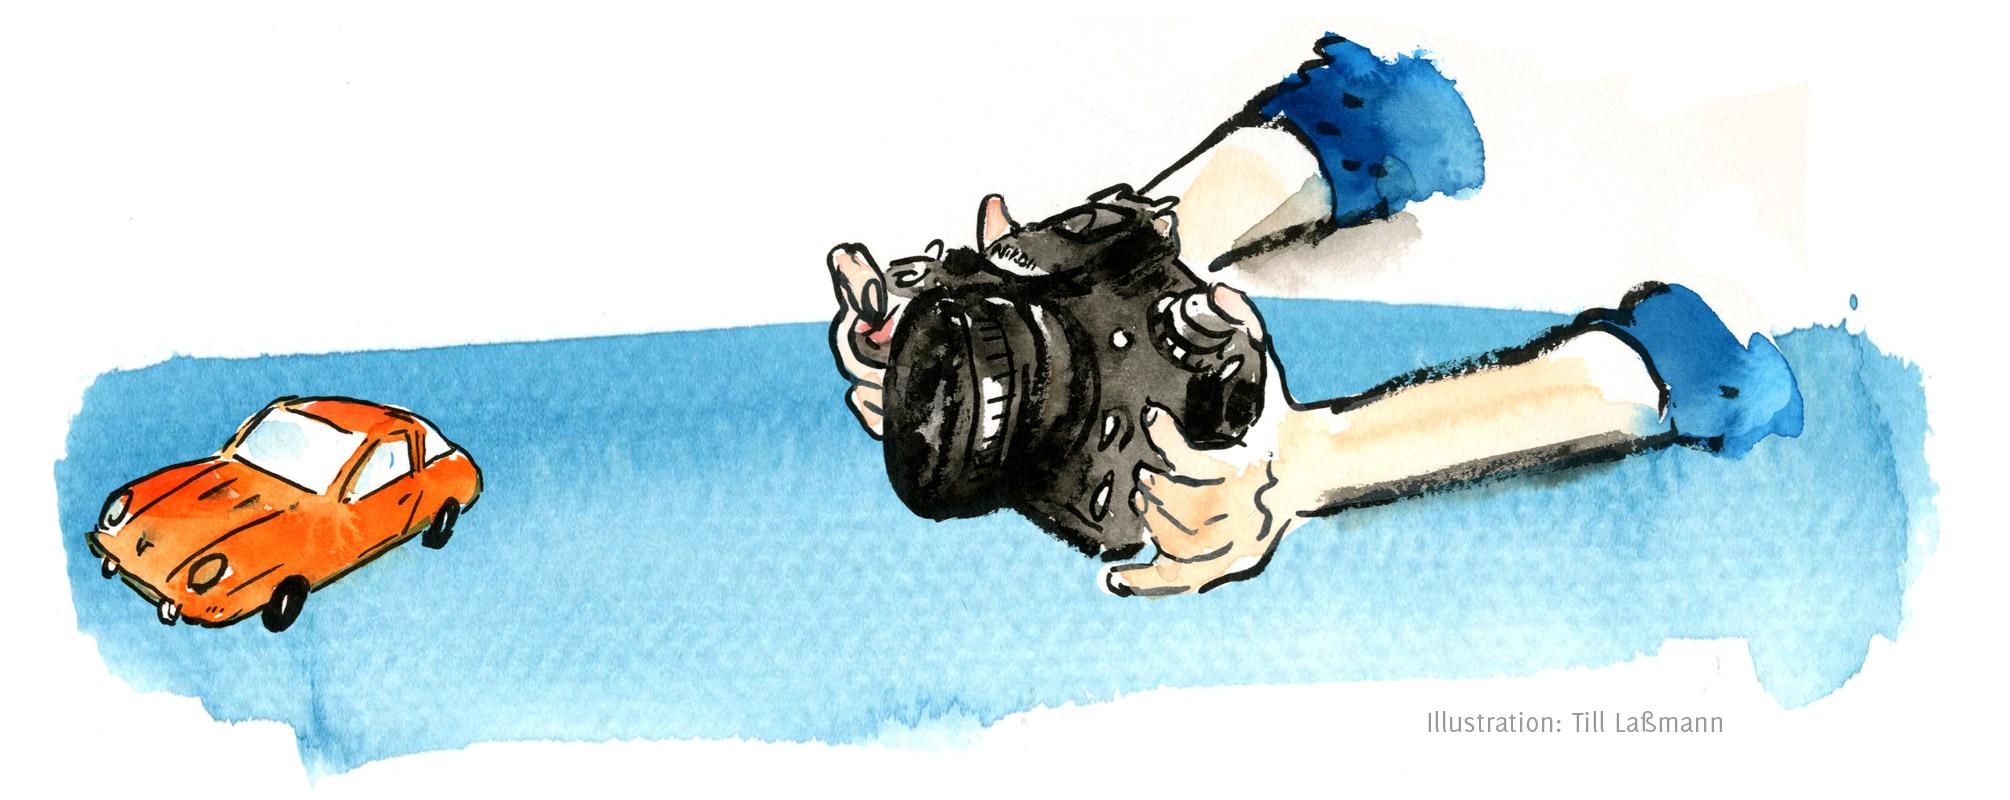 Automobilfotografie Eva Gieselberg Illustration von Till Laßmann